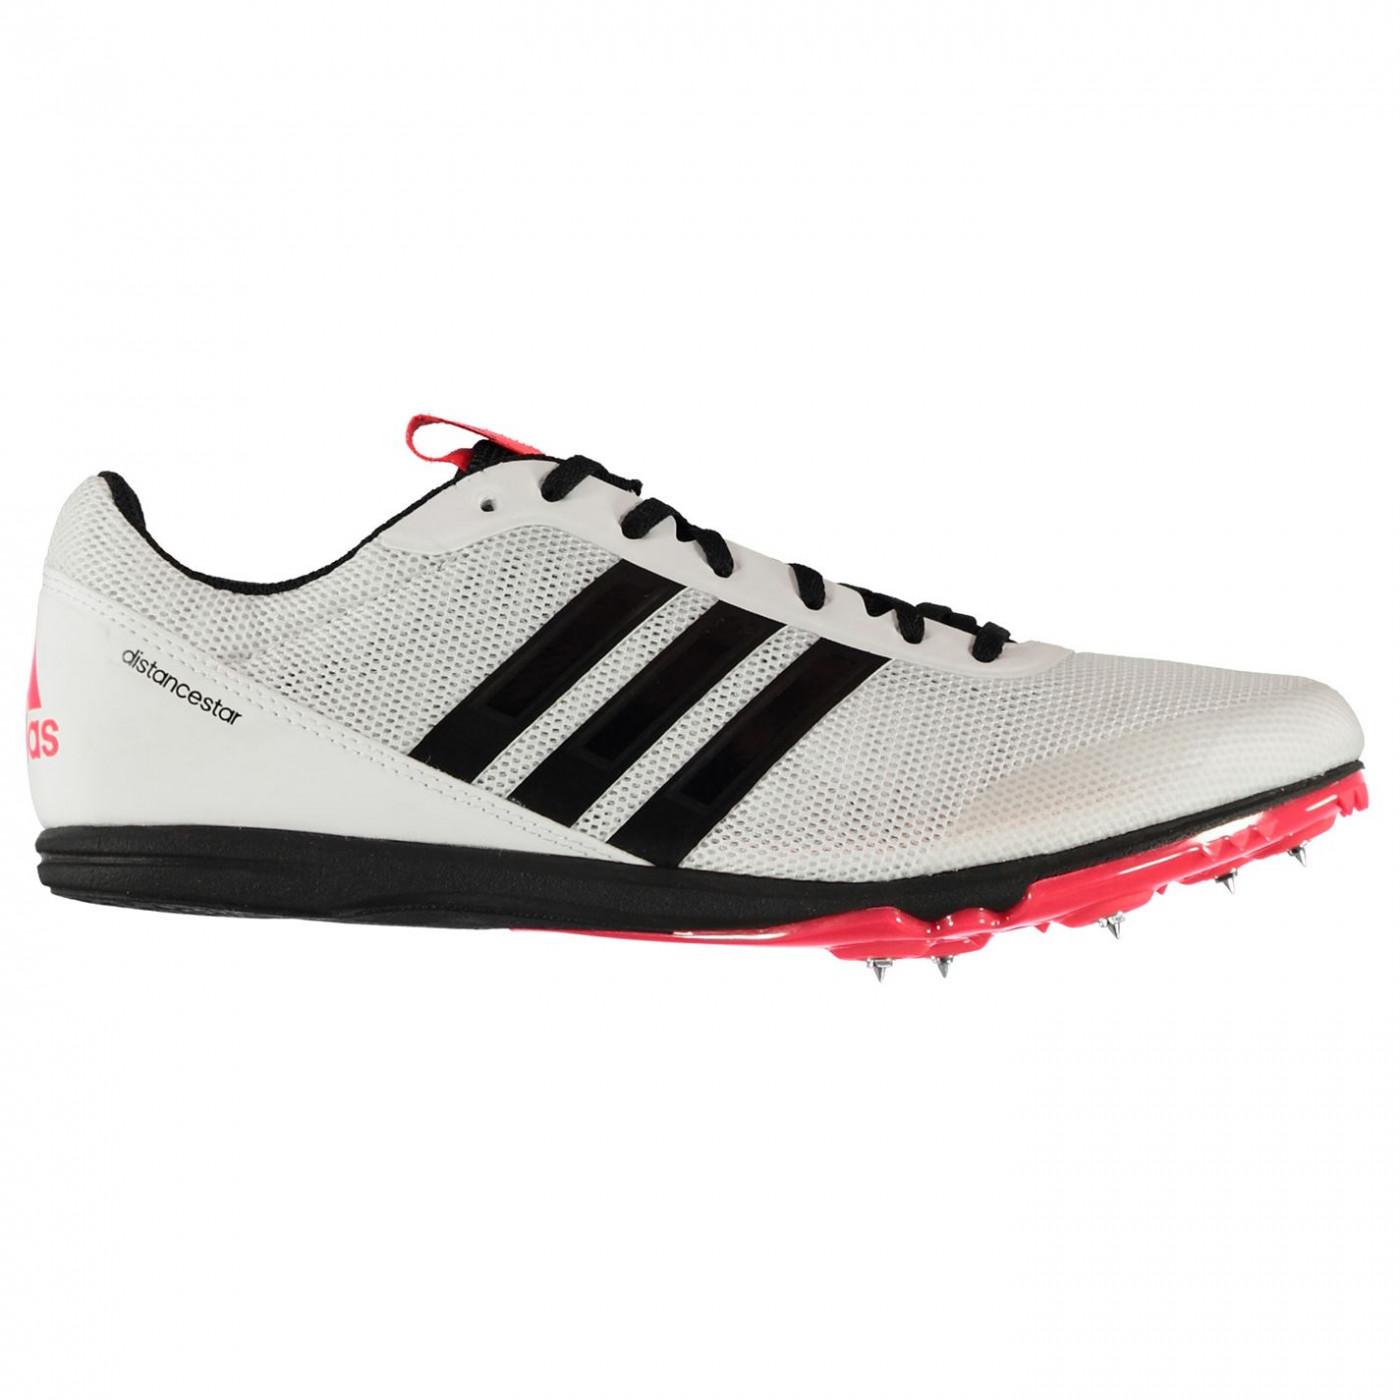 Adidas Distancestar Mens Running Spikes